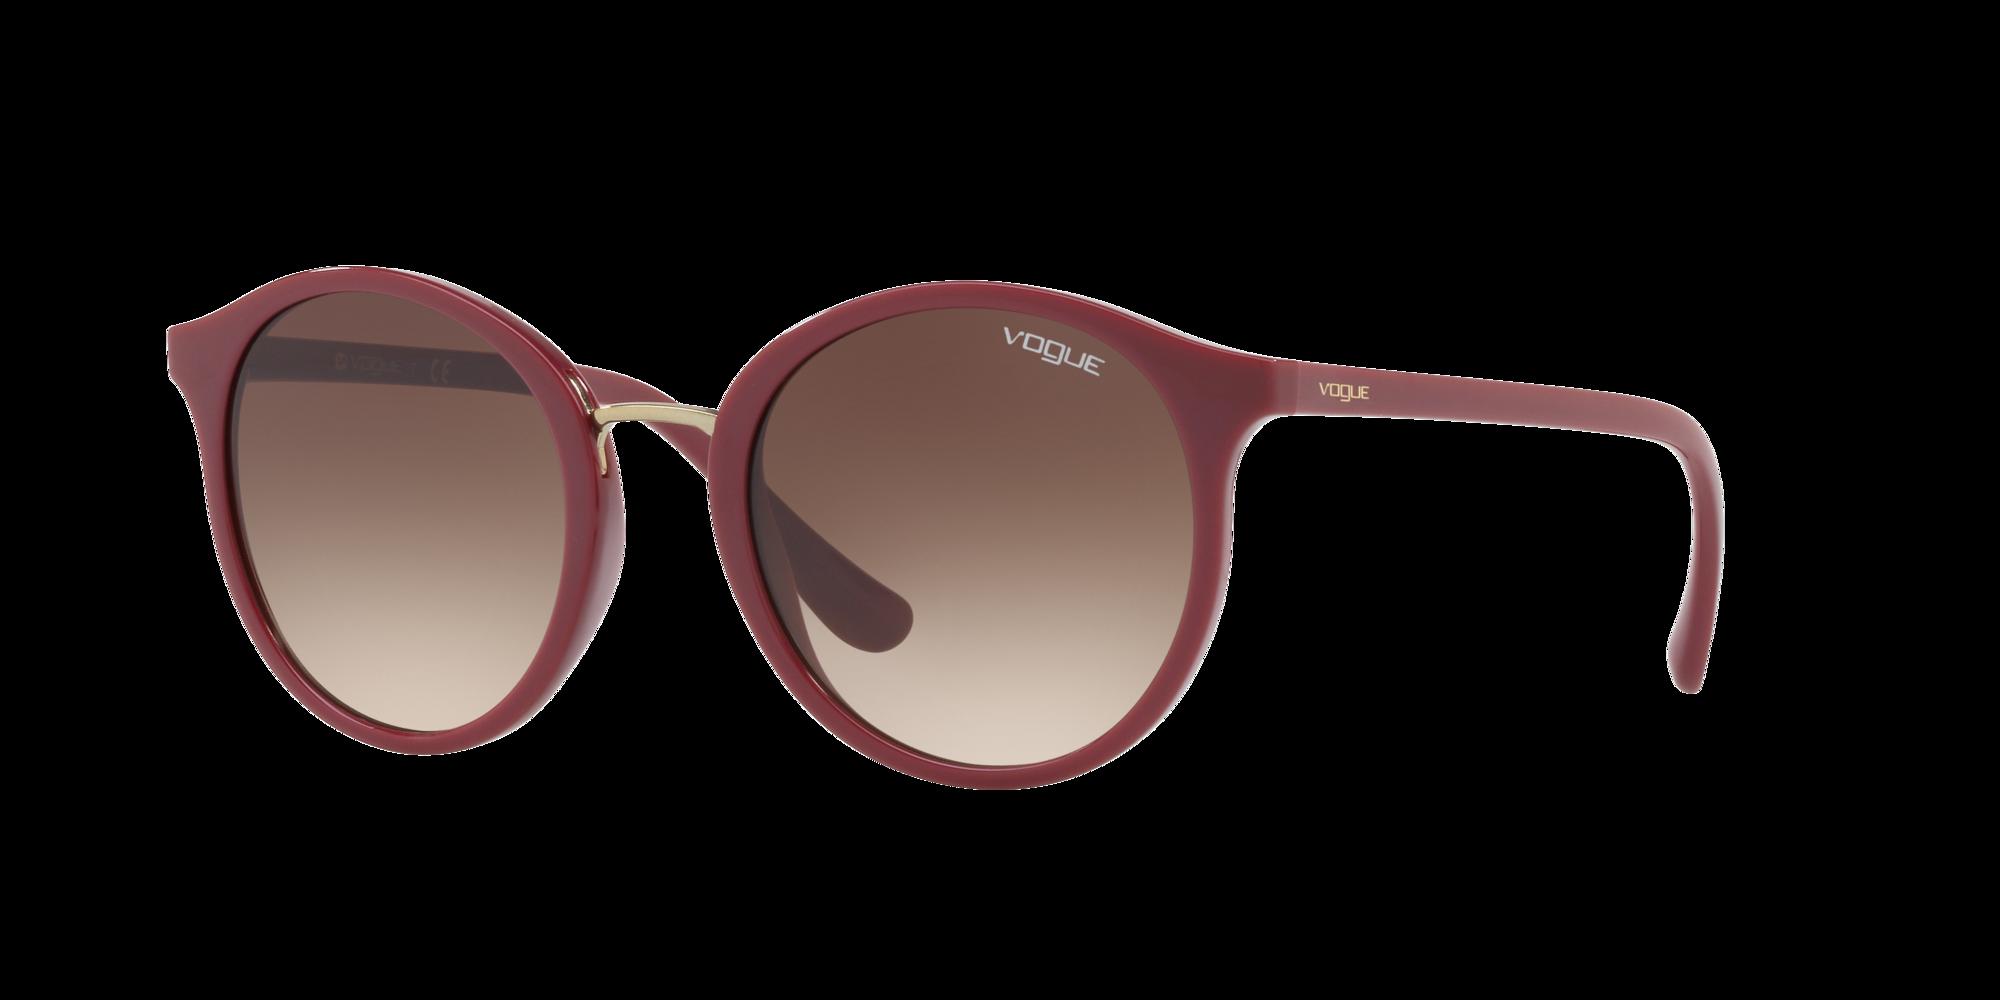 Vogue Eyewear Unisex  VO5166S -  Frame color: Rojo, Lens color: Marron, Size 51-21/140